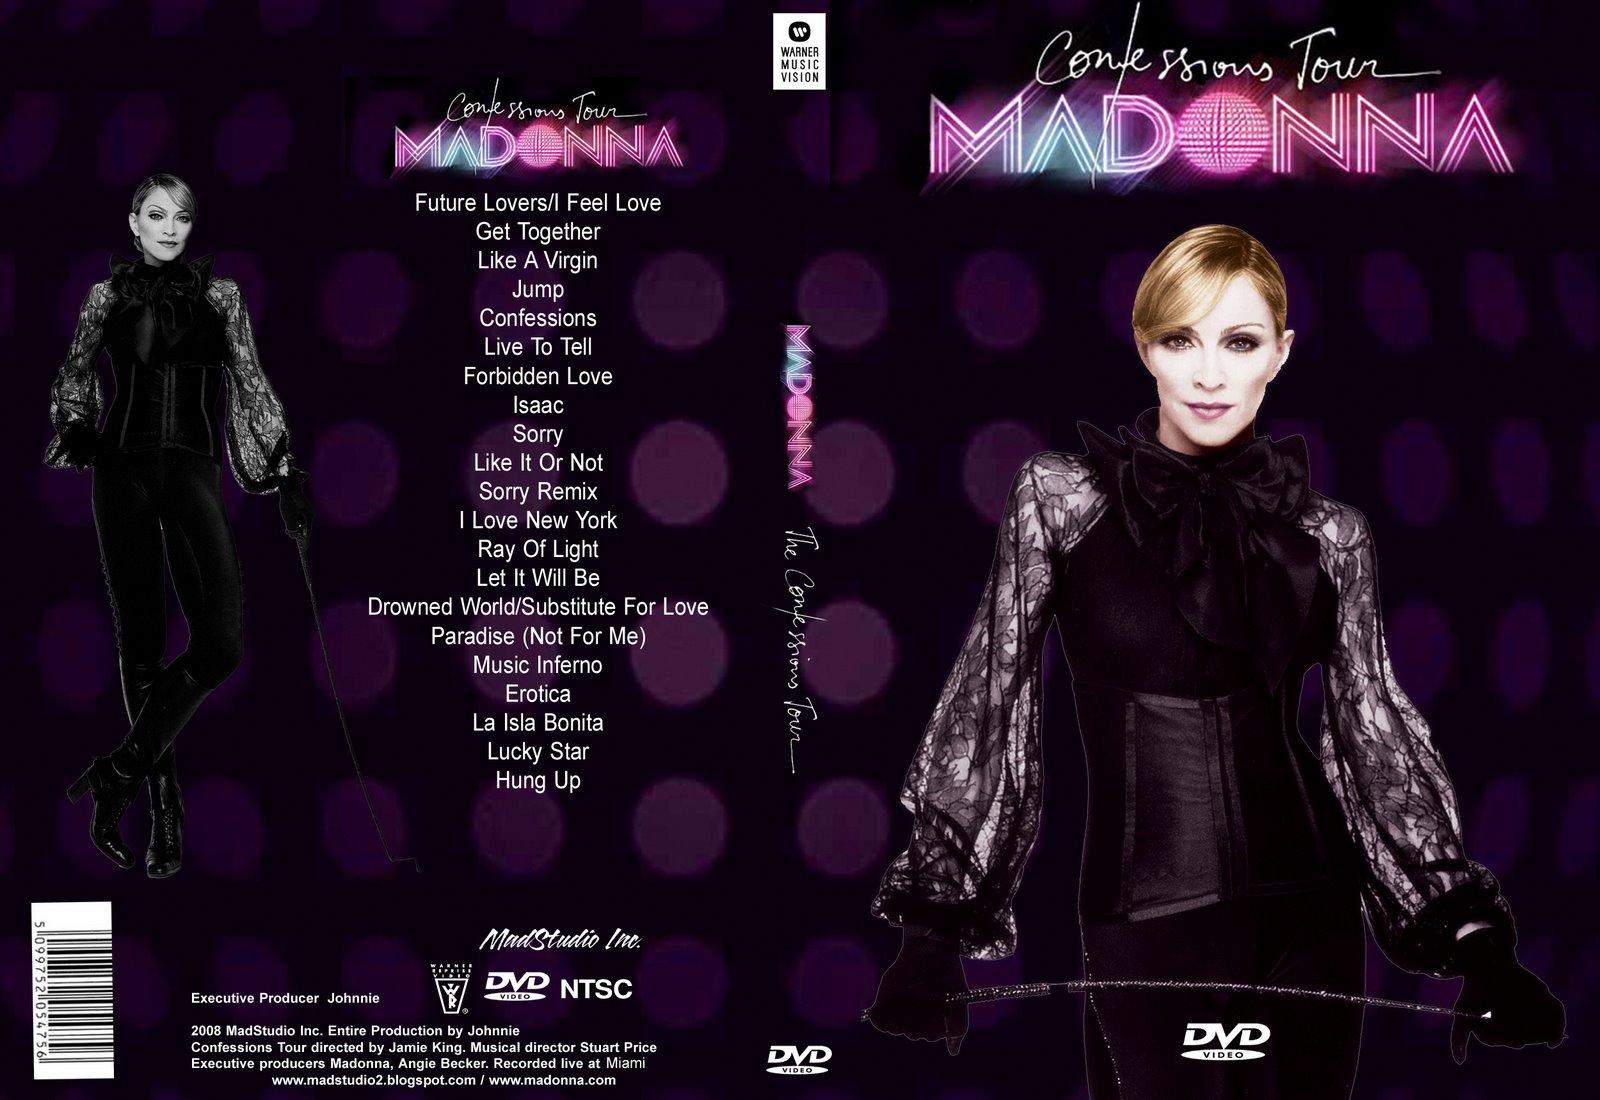 madonna confessions tour poster - photo #19